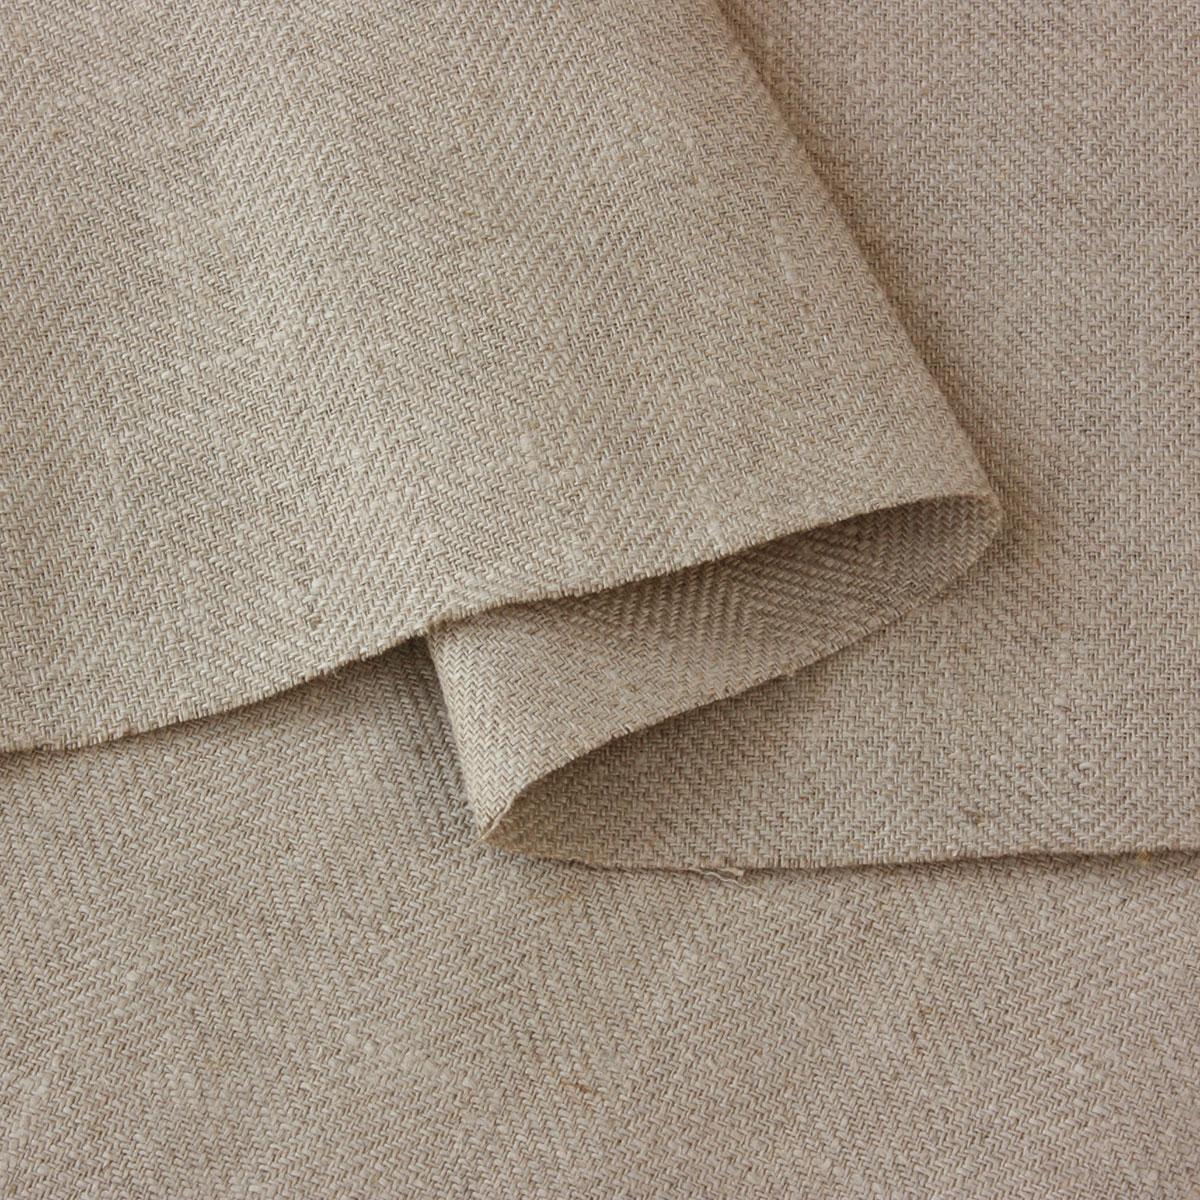 150cm巾 【 リネン100% 生地 】 ナチュラル ヘリンボーン 厚地 1m単位 ORF44-201【ソファカバー、エプロン、コートに最適】